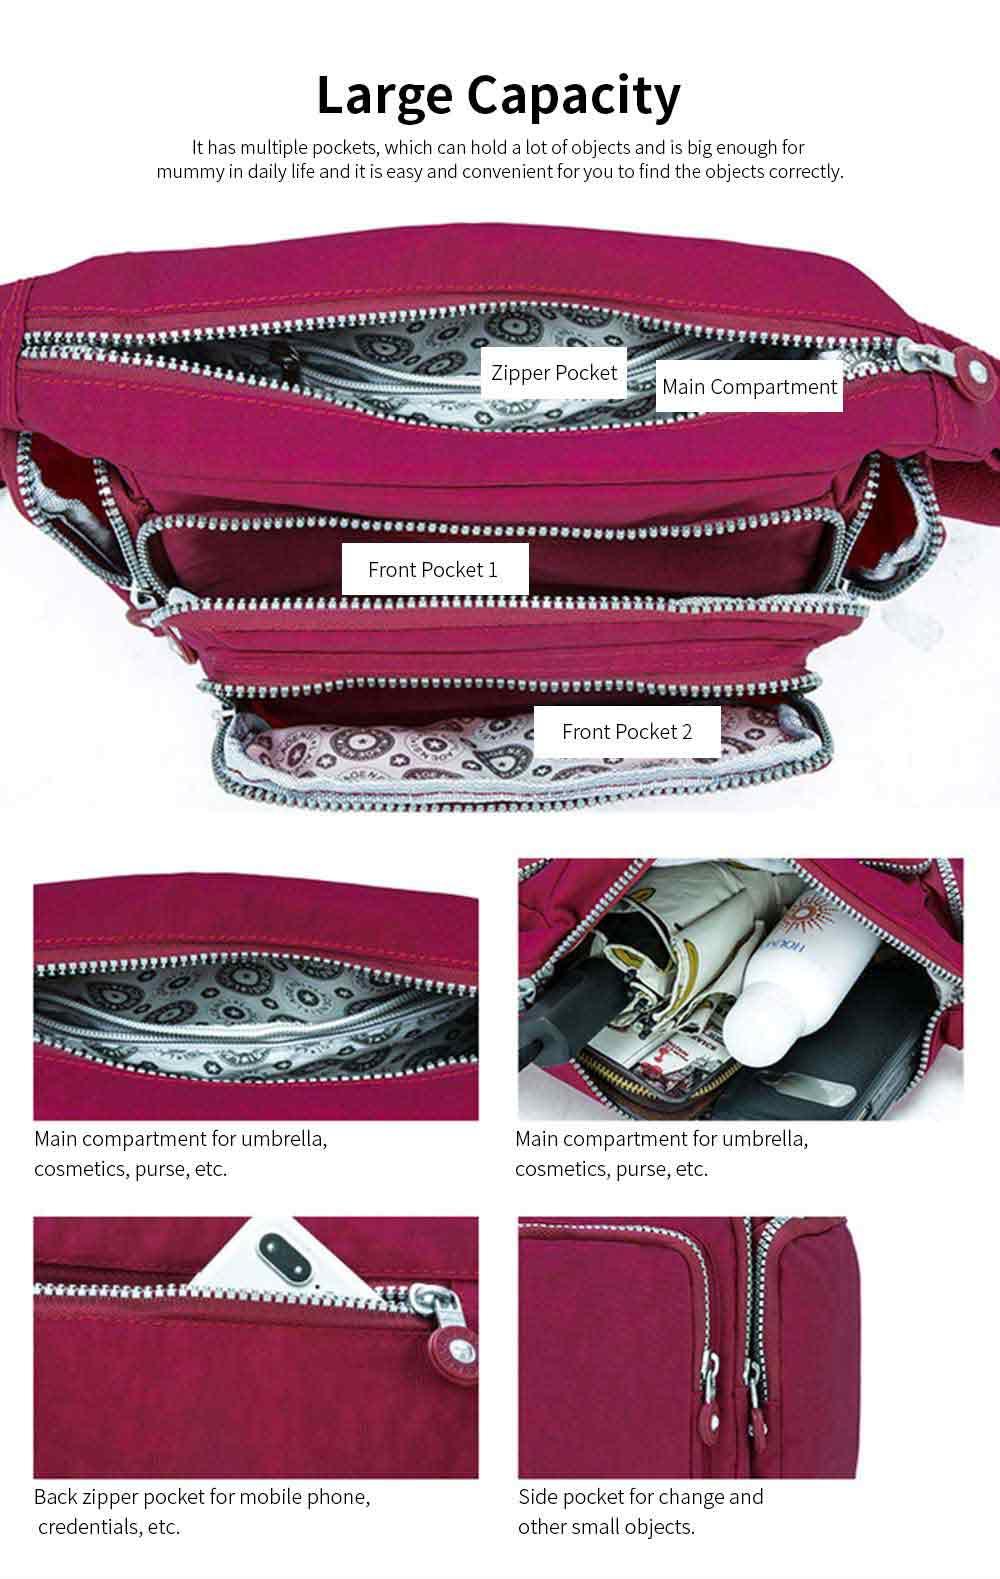 Waterproof High Density Nylon Mummy Shoulder Bag, Large Capacity Multiple Pockets Messenger Cross Body Hand Bag 4